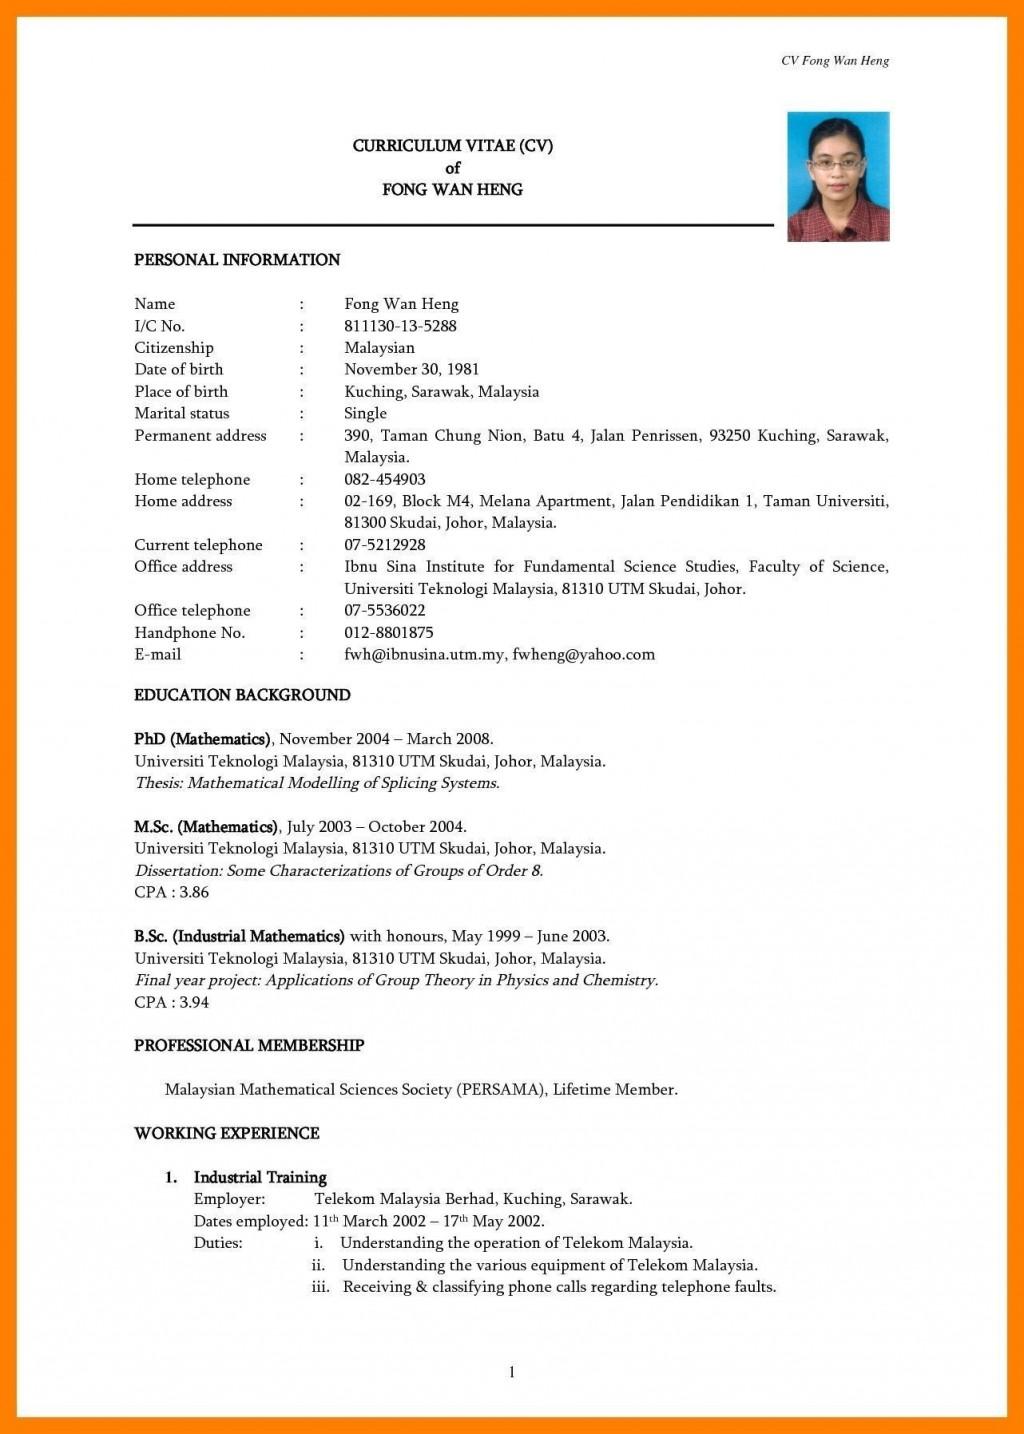 000 Wonderful Download Resume Sample Free Design  Teacher Cv Graphic Designer Word Format Nurse TemplateLarge